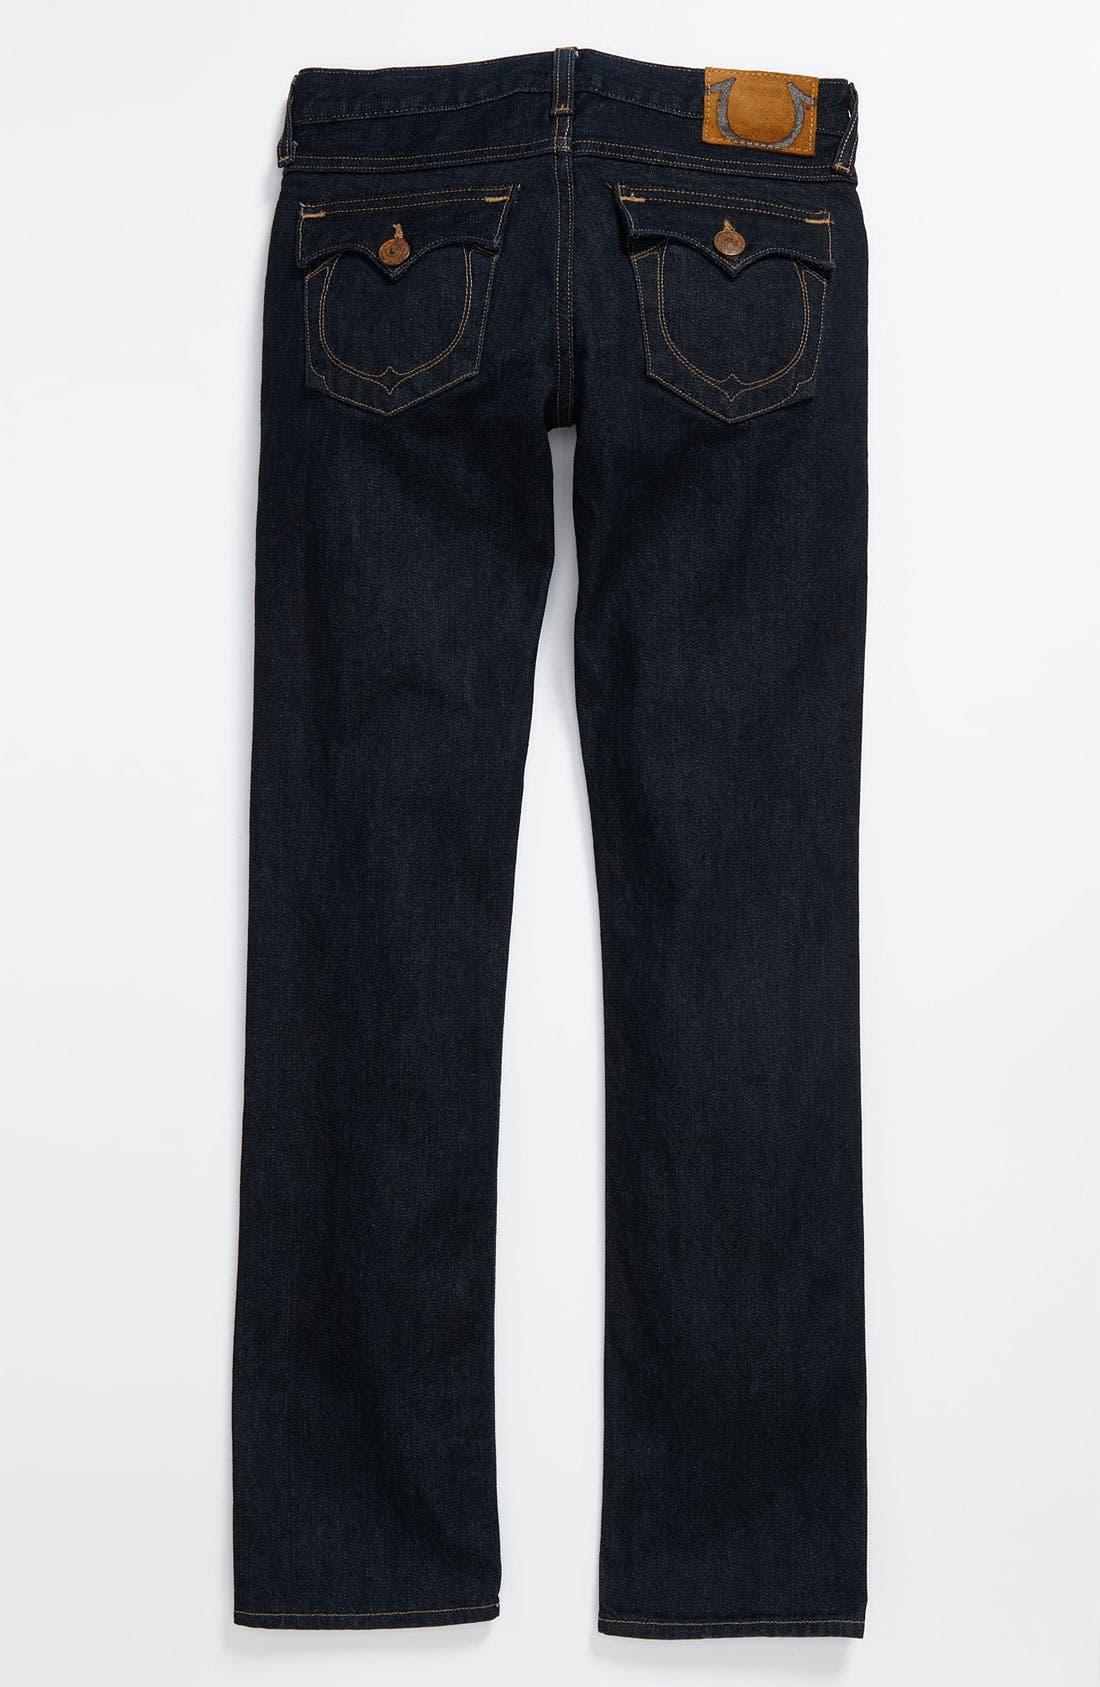 Alternate Image 1 Selected - True Religion Brand Jeans 'Jack Snake Eyes' Straight Leg Jeans (Big Boys)